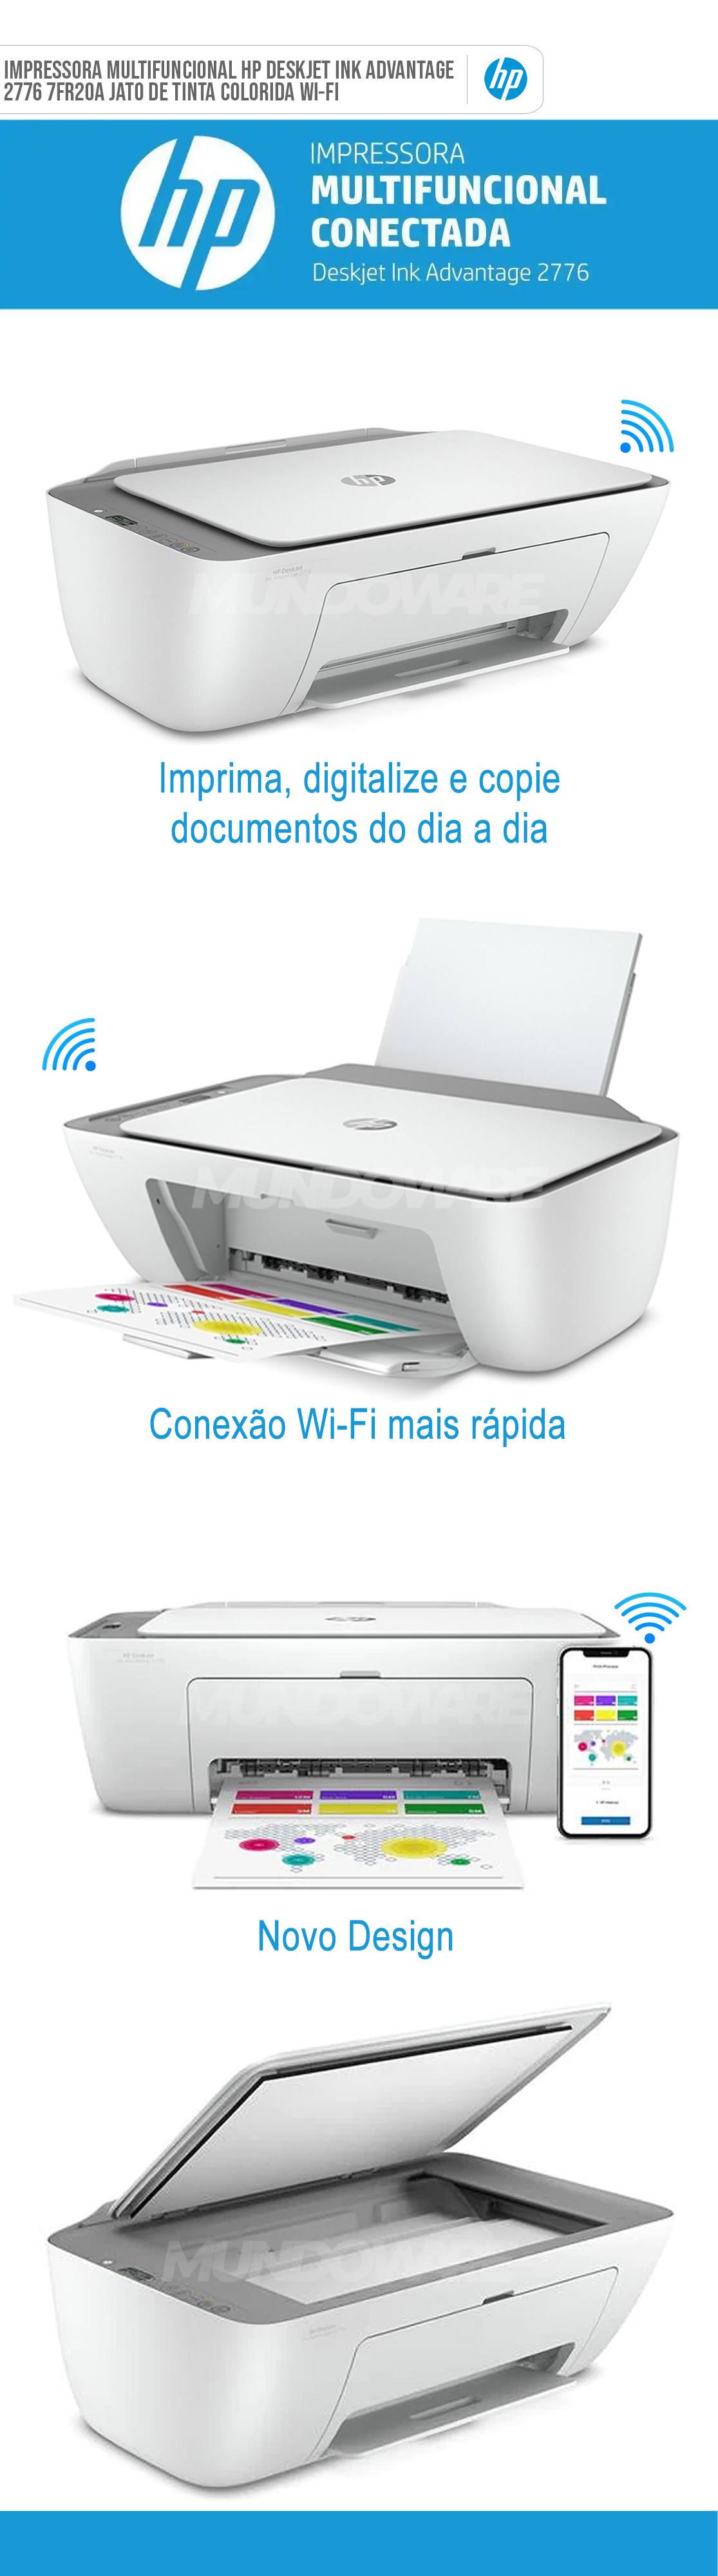 Impressora Multifuncional HP Deskjet Ink Advantage 2776 7FR20A Jato de Tinta Colorida Wireless